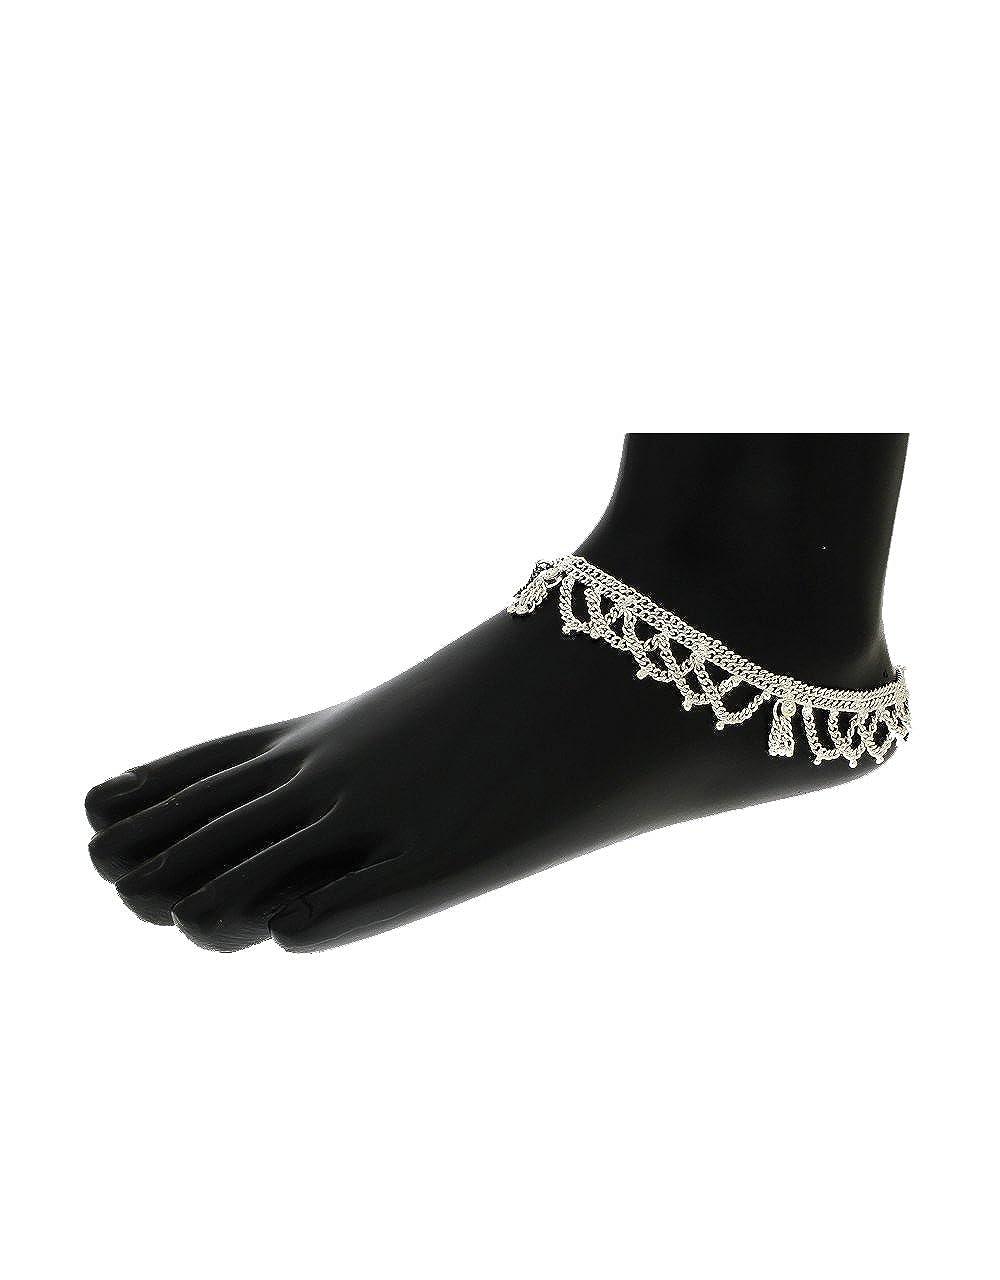 Anuradha Art Prsenting This Wonderful Designer Anklets//Payal for Women//Girls